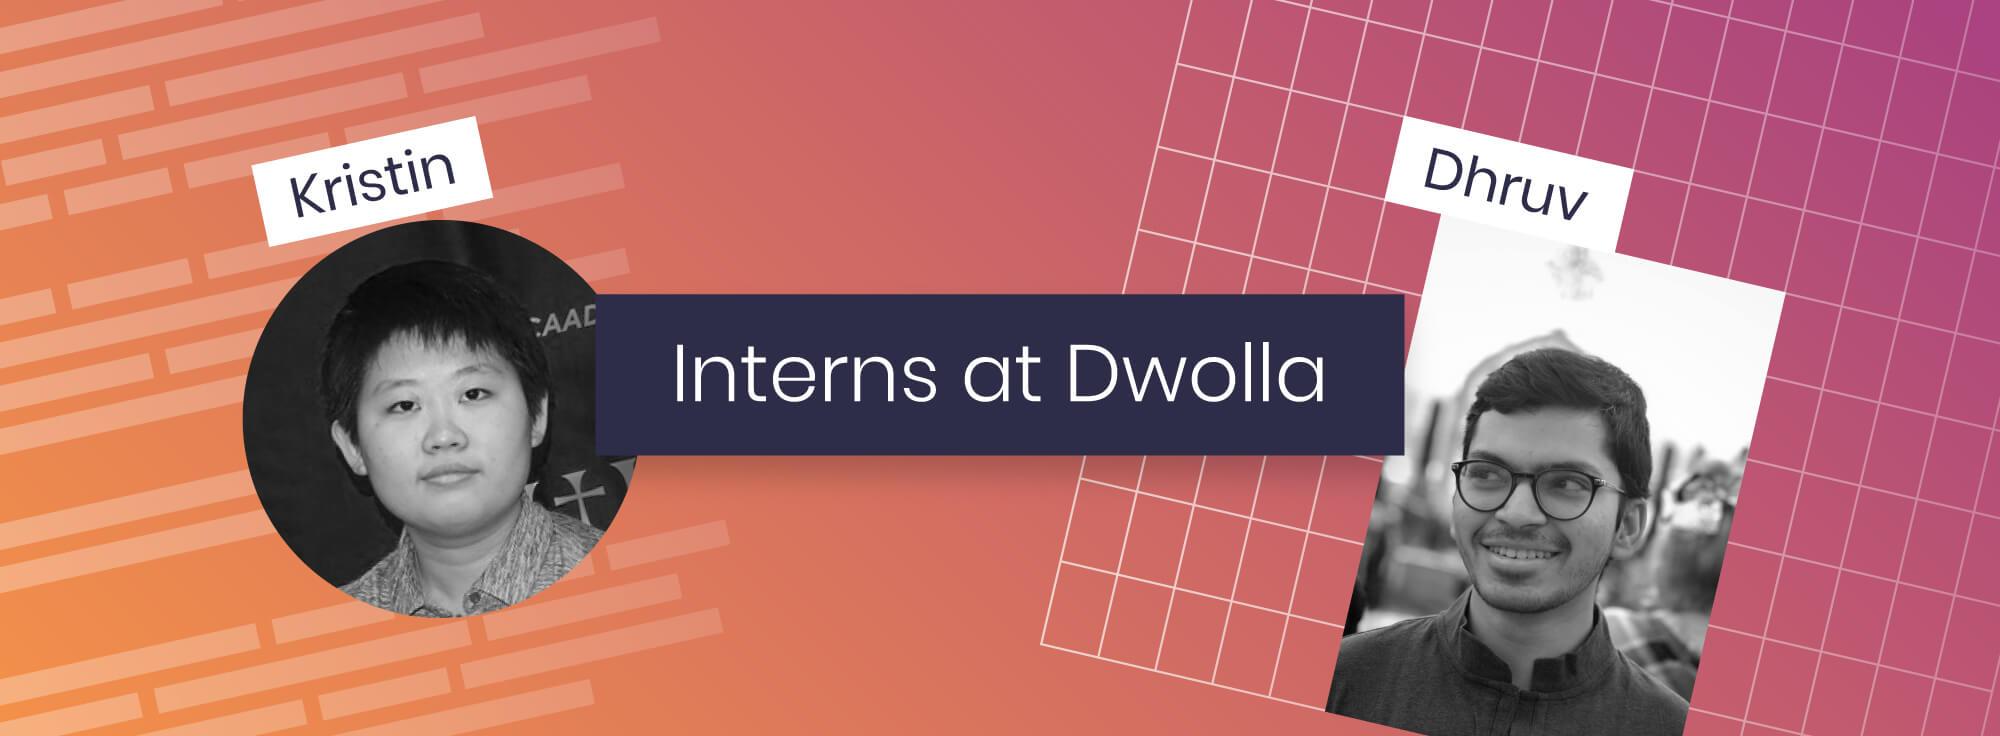 Software Engineer Interns